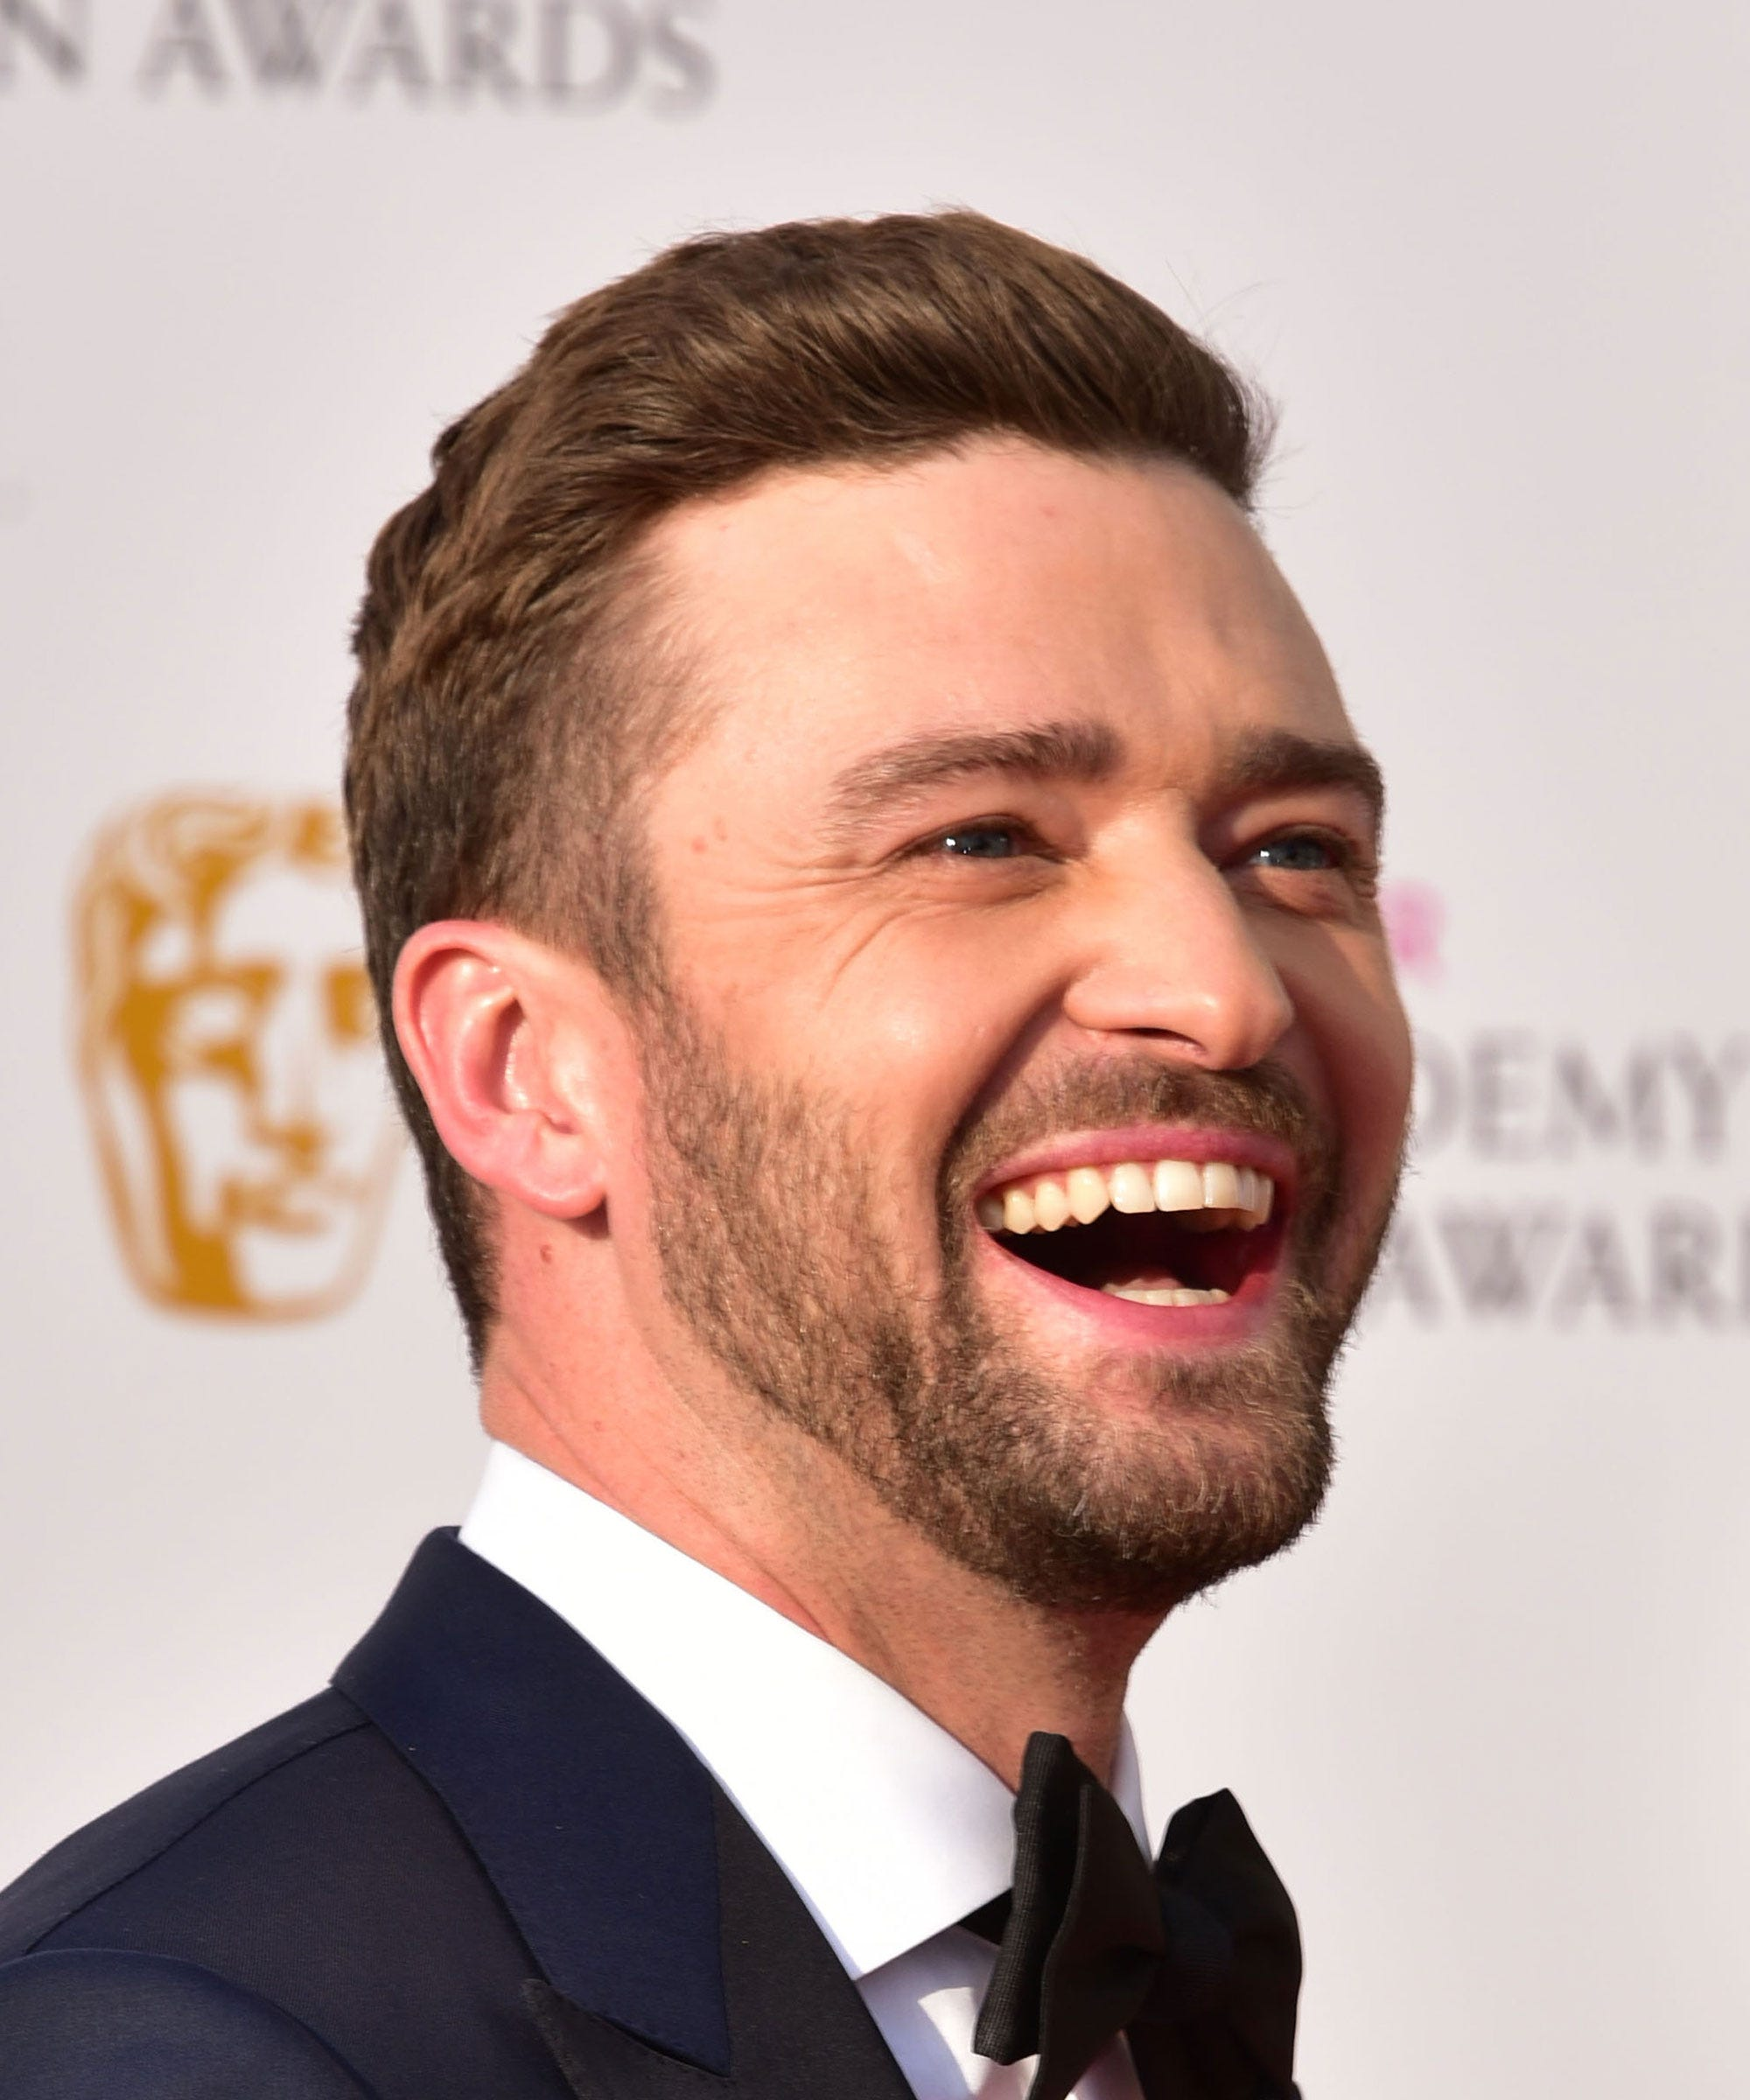 Justin Timberlake New Music Video Annoying Dancing Cast - Cool cars kelsey waters lyrics